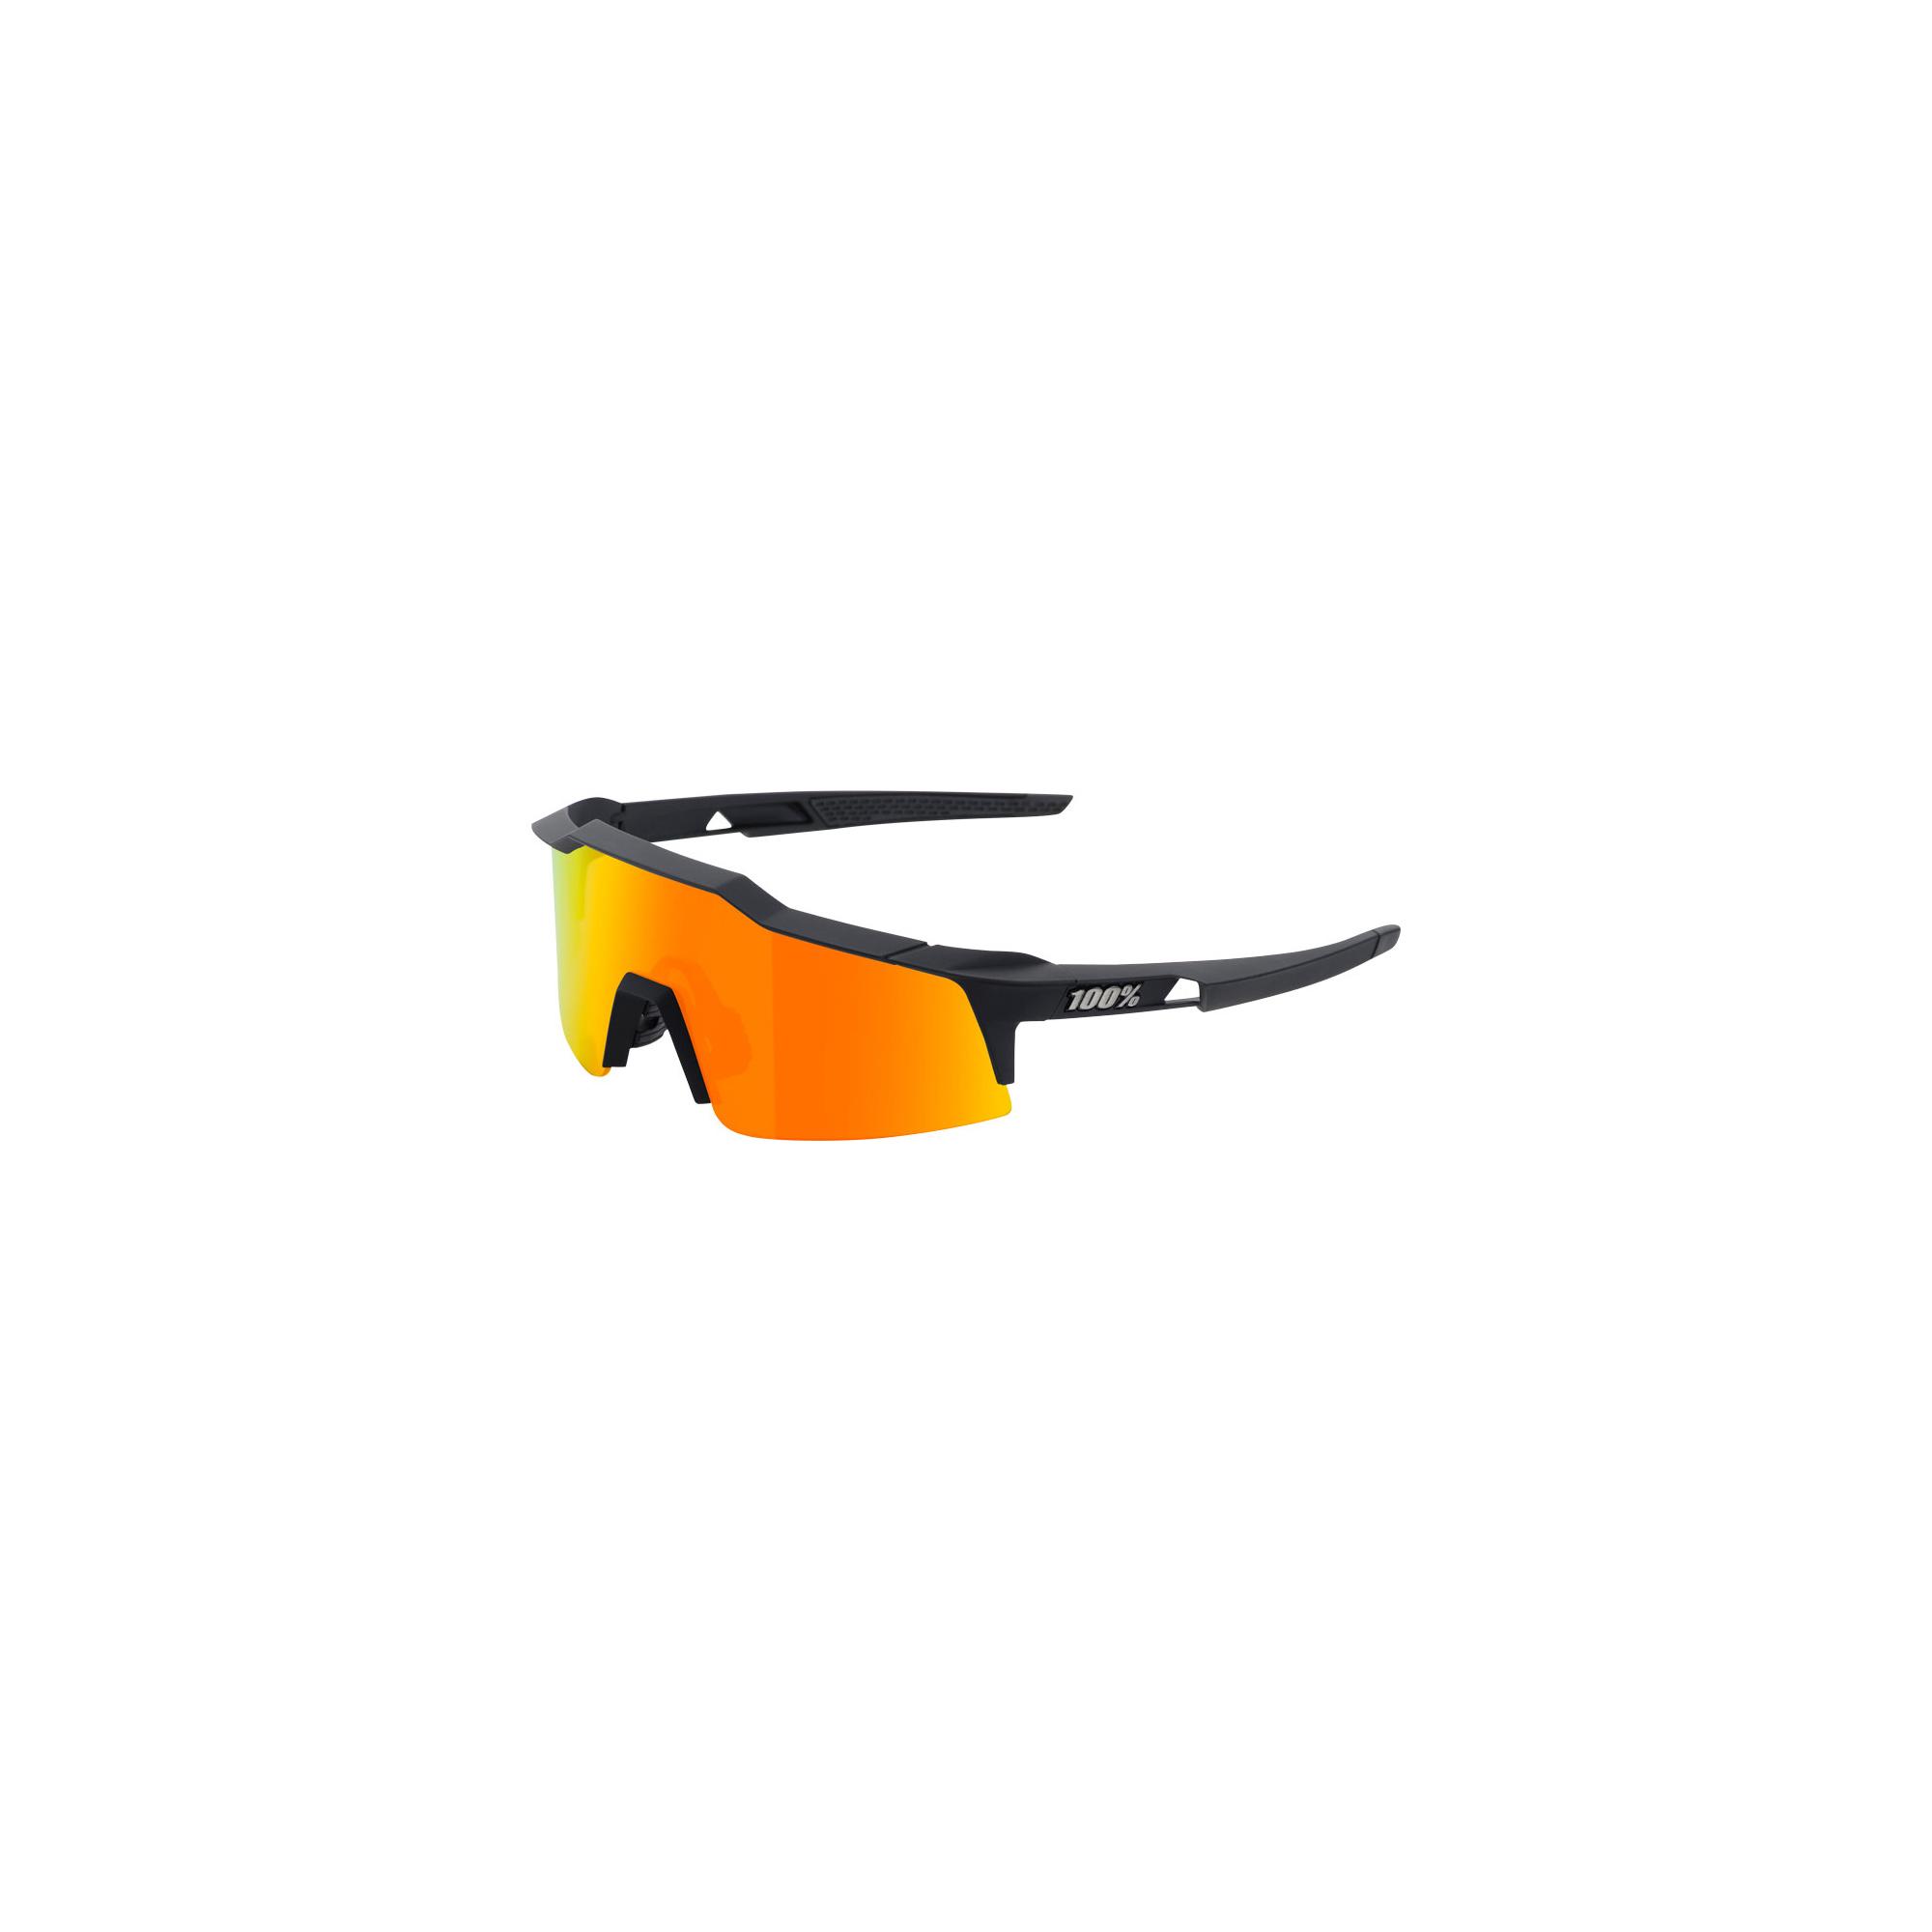 2a236a1b95f Details about 100% Speedcraft SL Sunglasses Black HiPER Red Multilayer  Mirror Lens